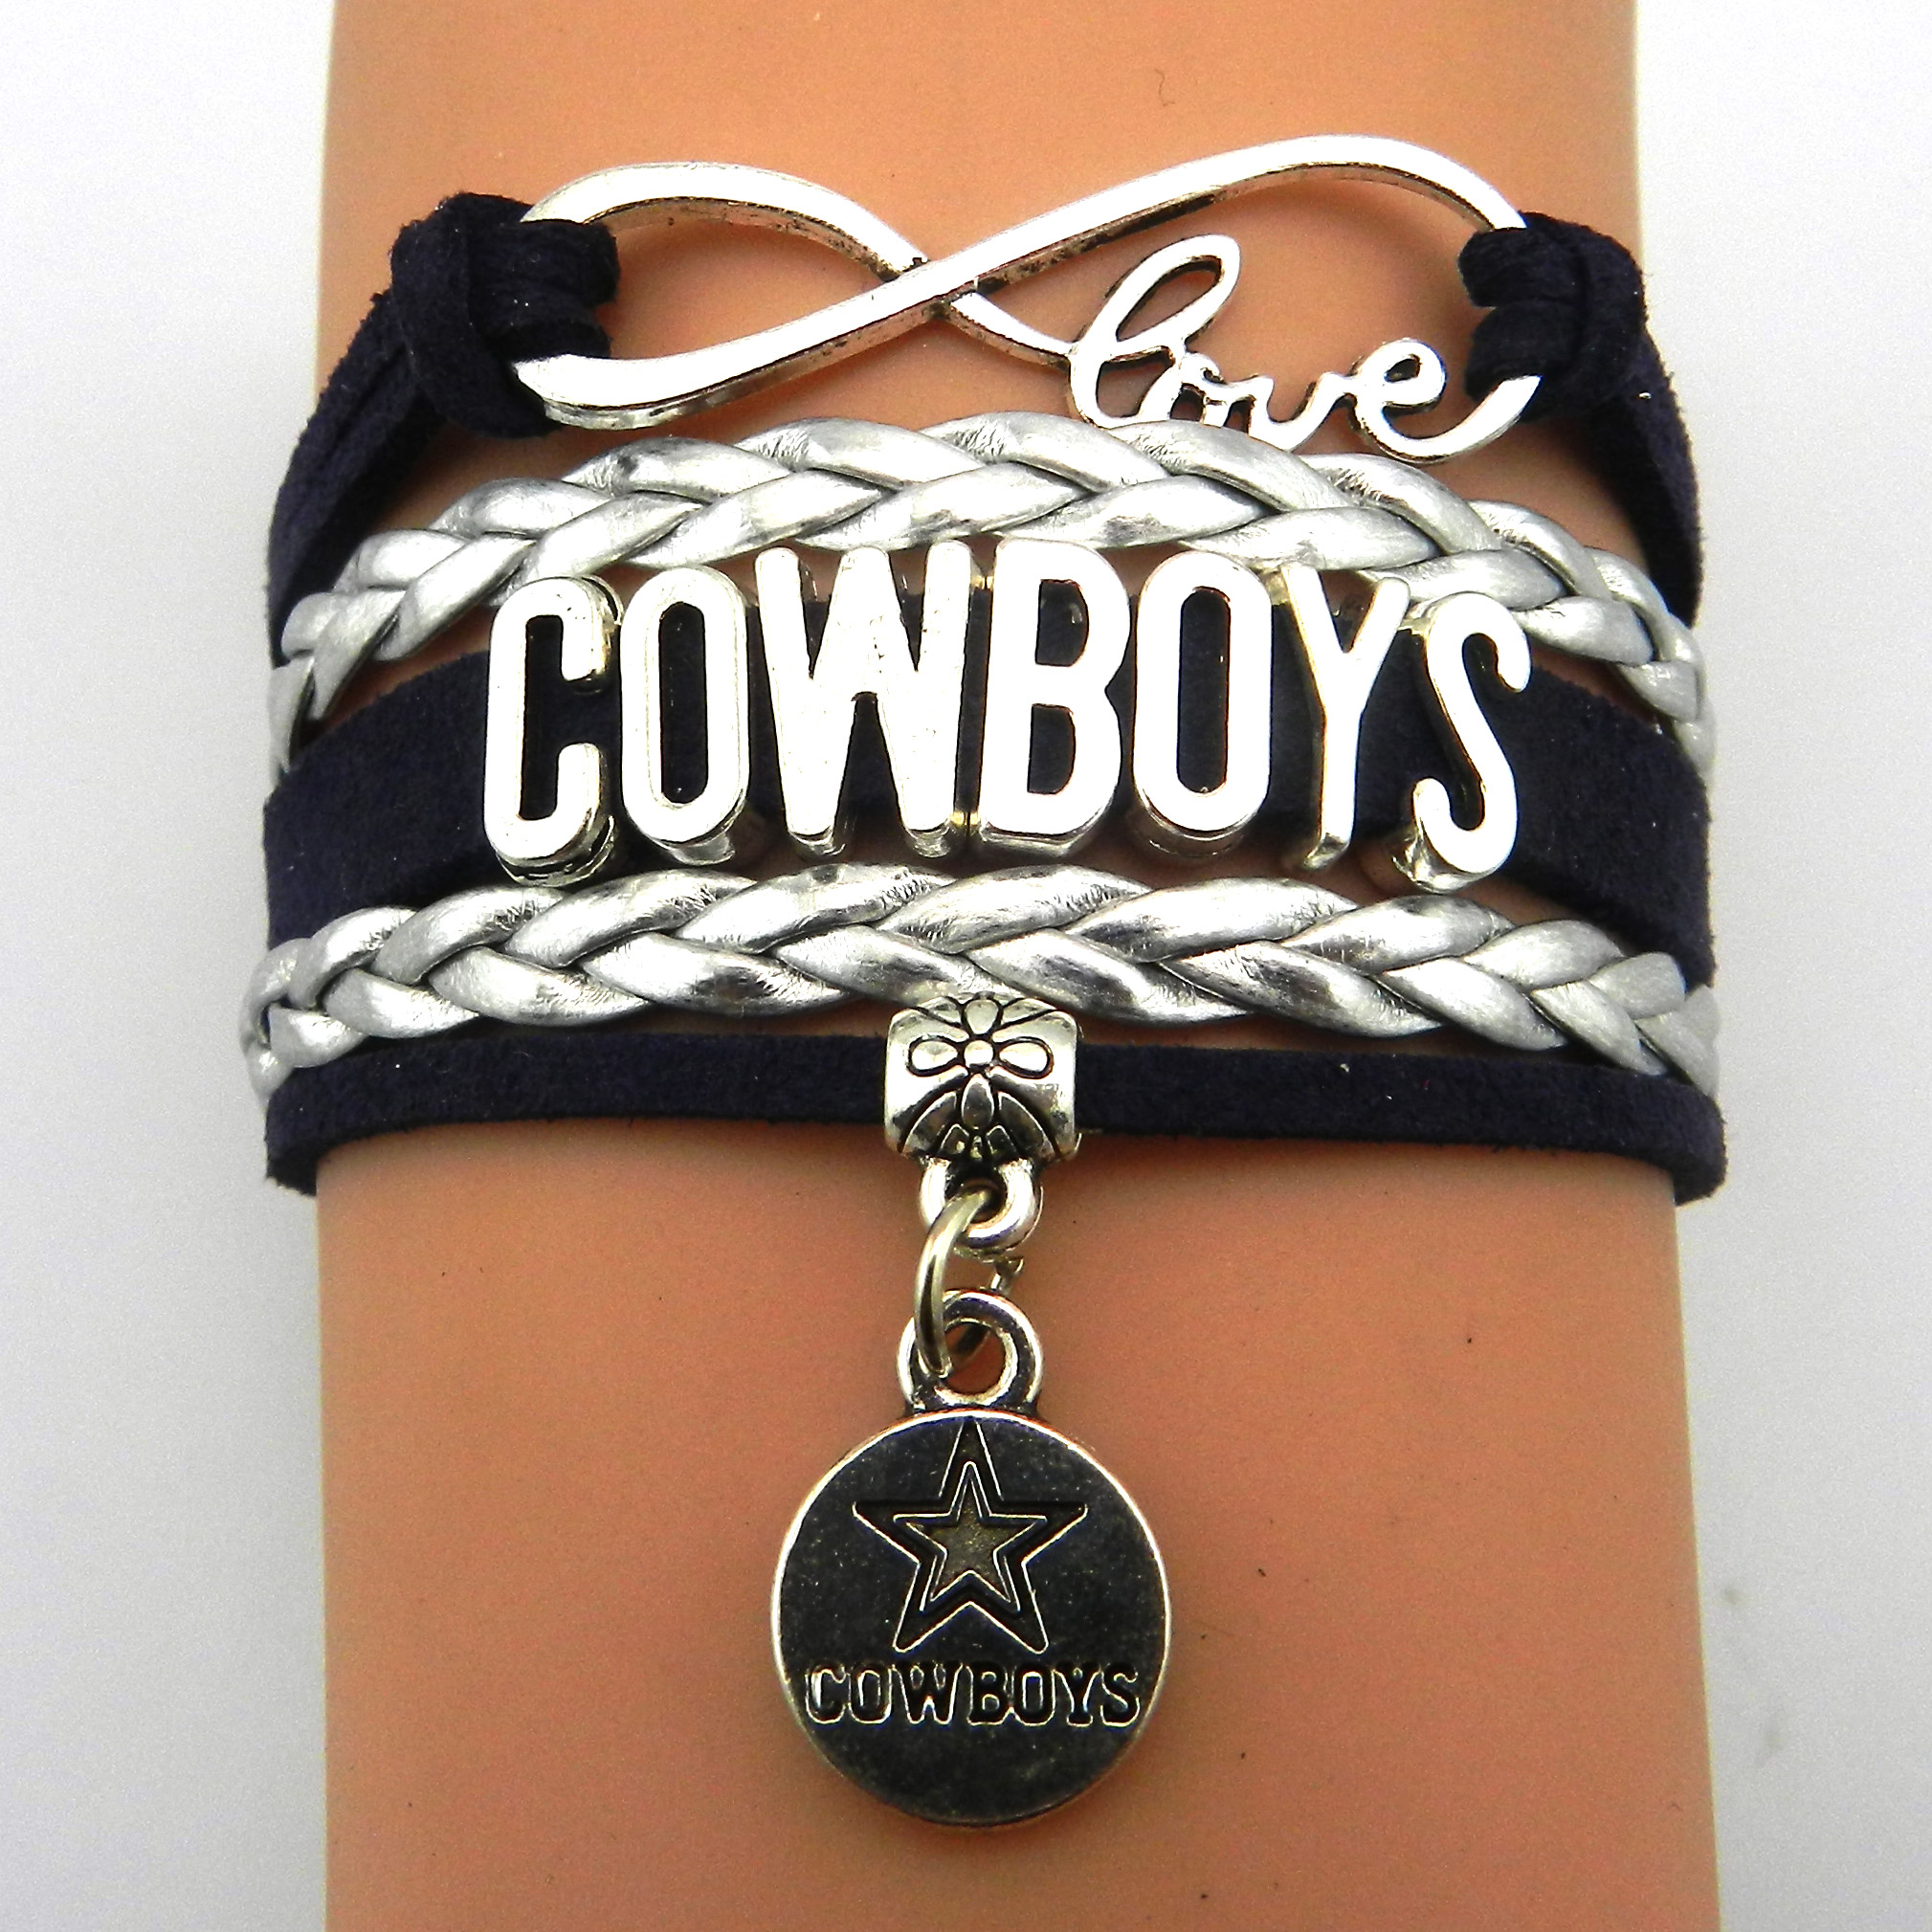 Dallas State Cowboys Football Team